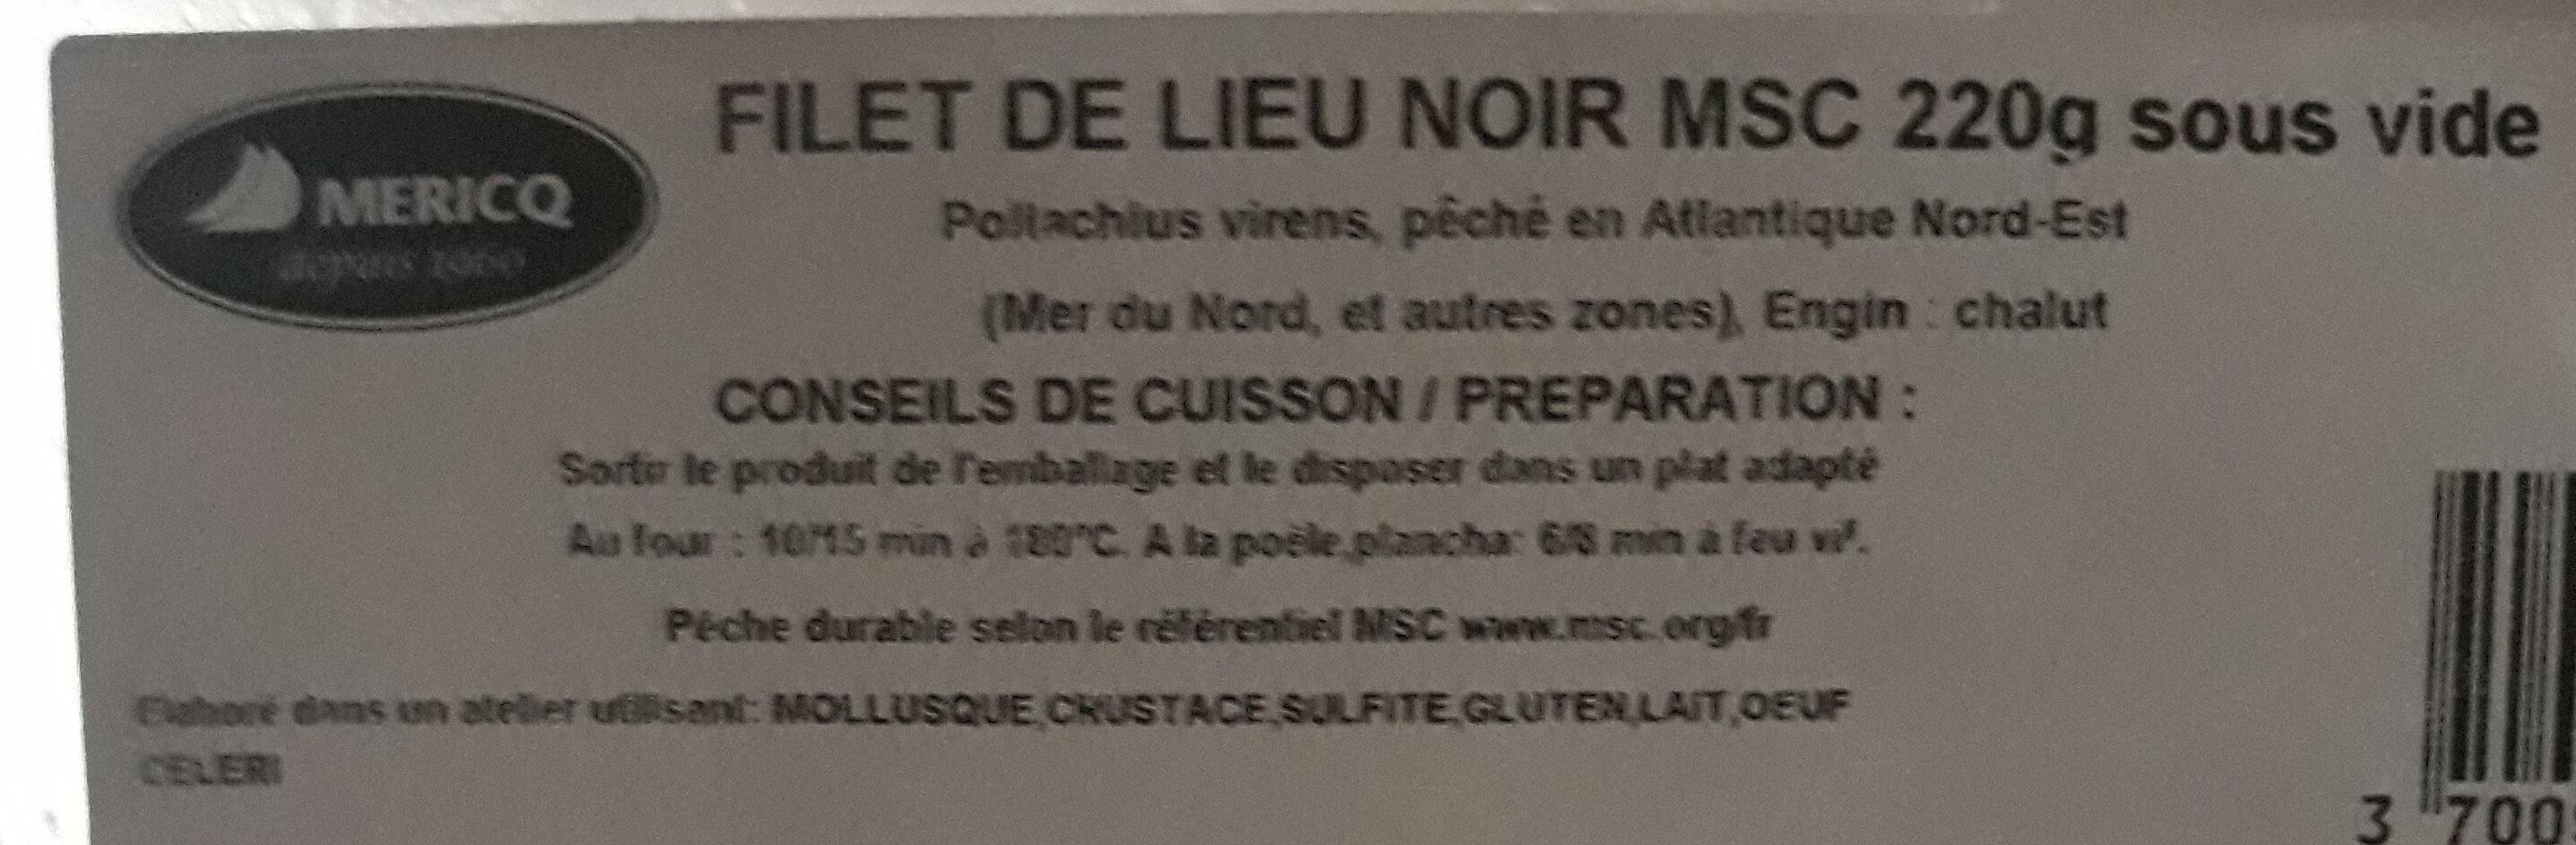 Filet lieu noir MSC sous vide - Ingrediënten - fr